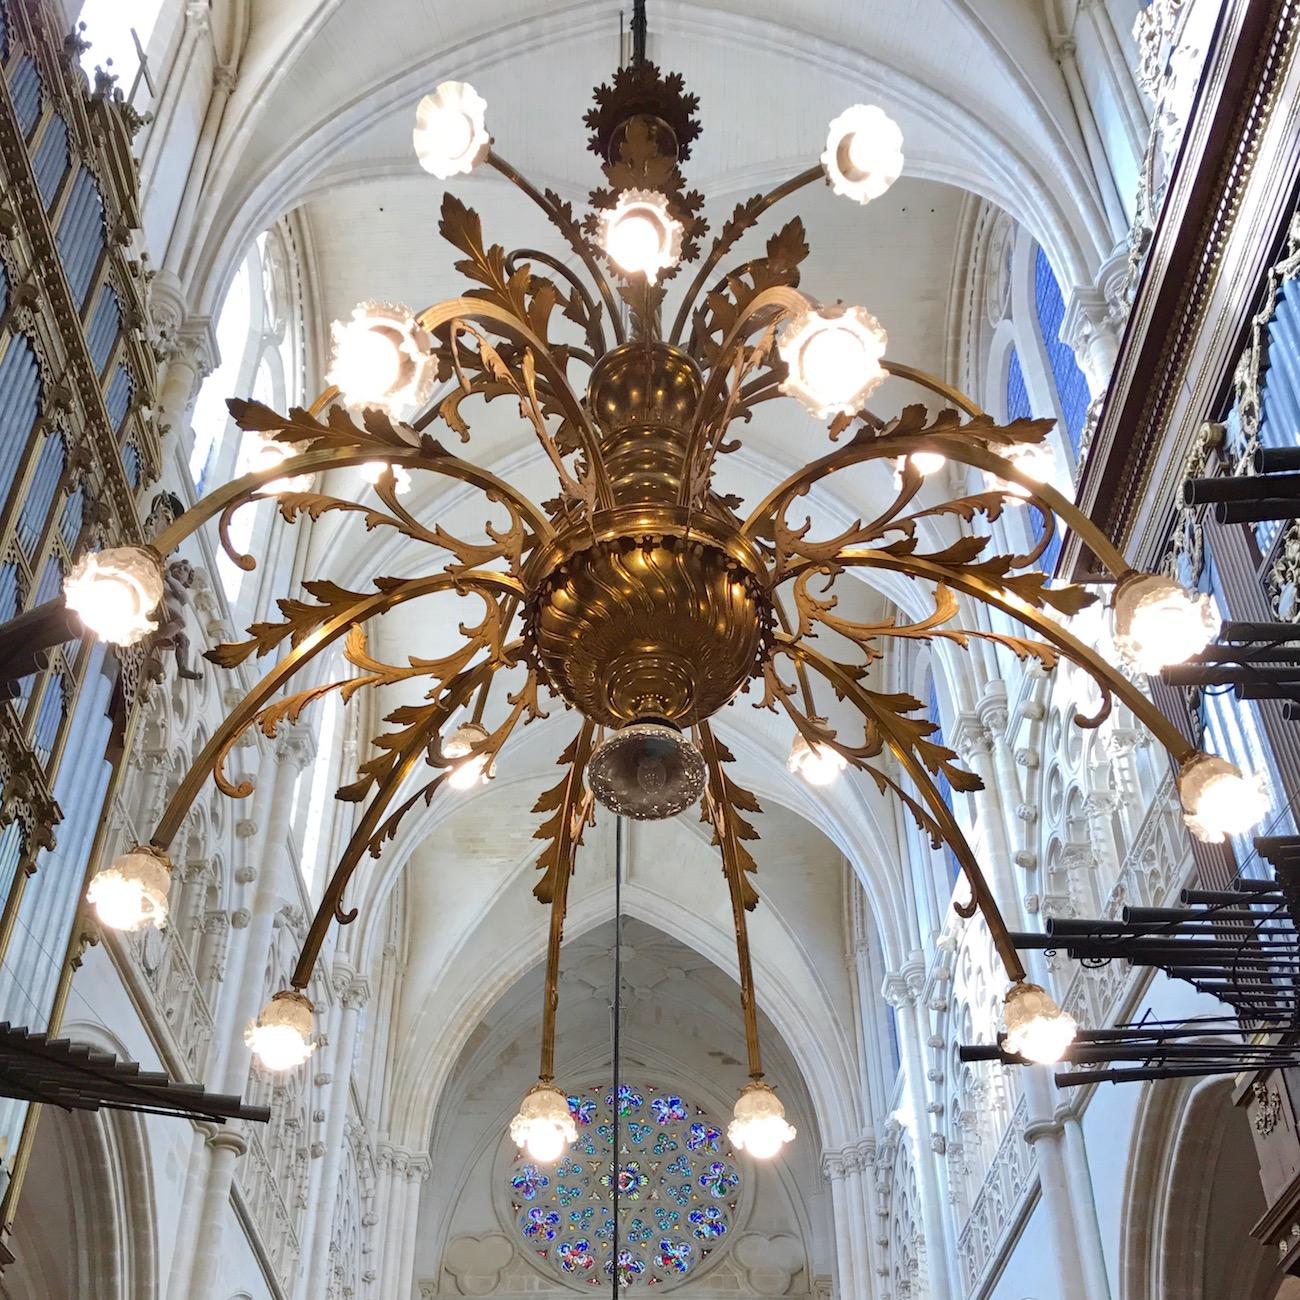 TRAVEL_Burgos Cathedral Lighting.jpg